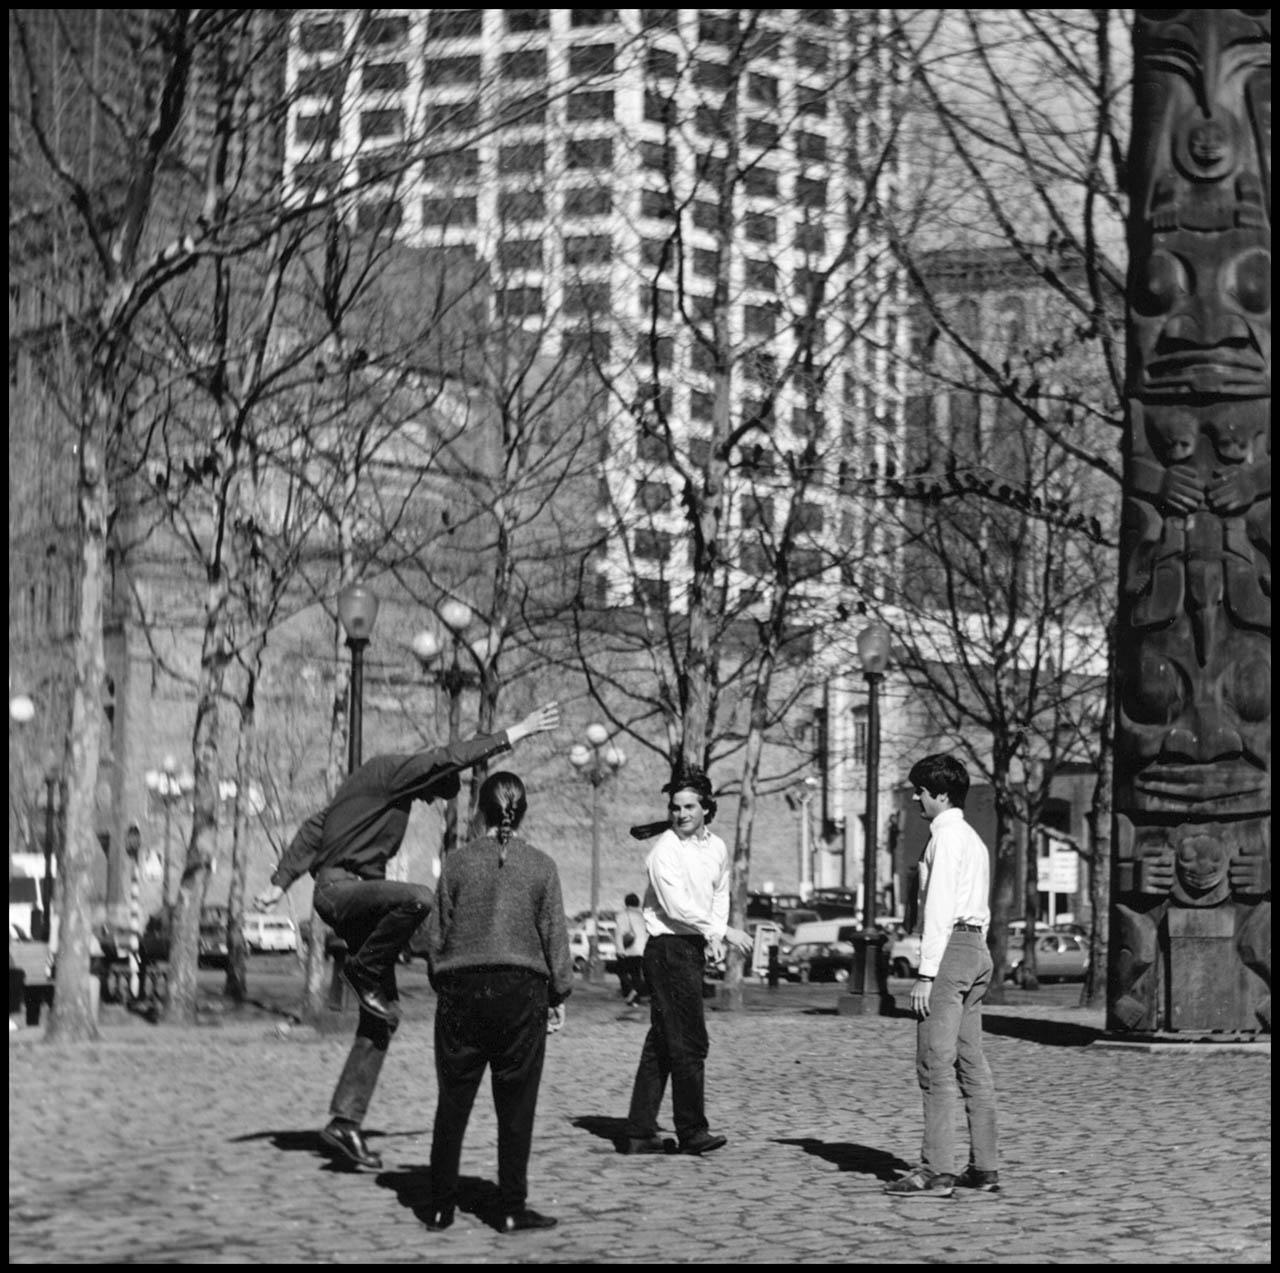 Occidental Square #15, 1990